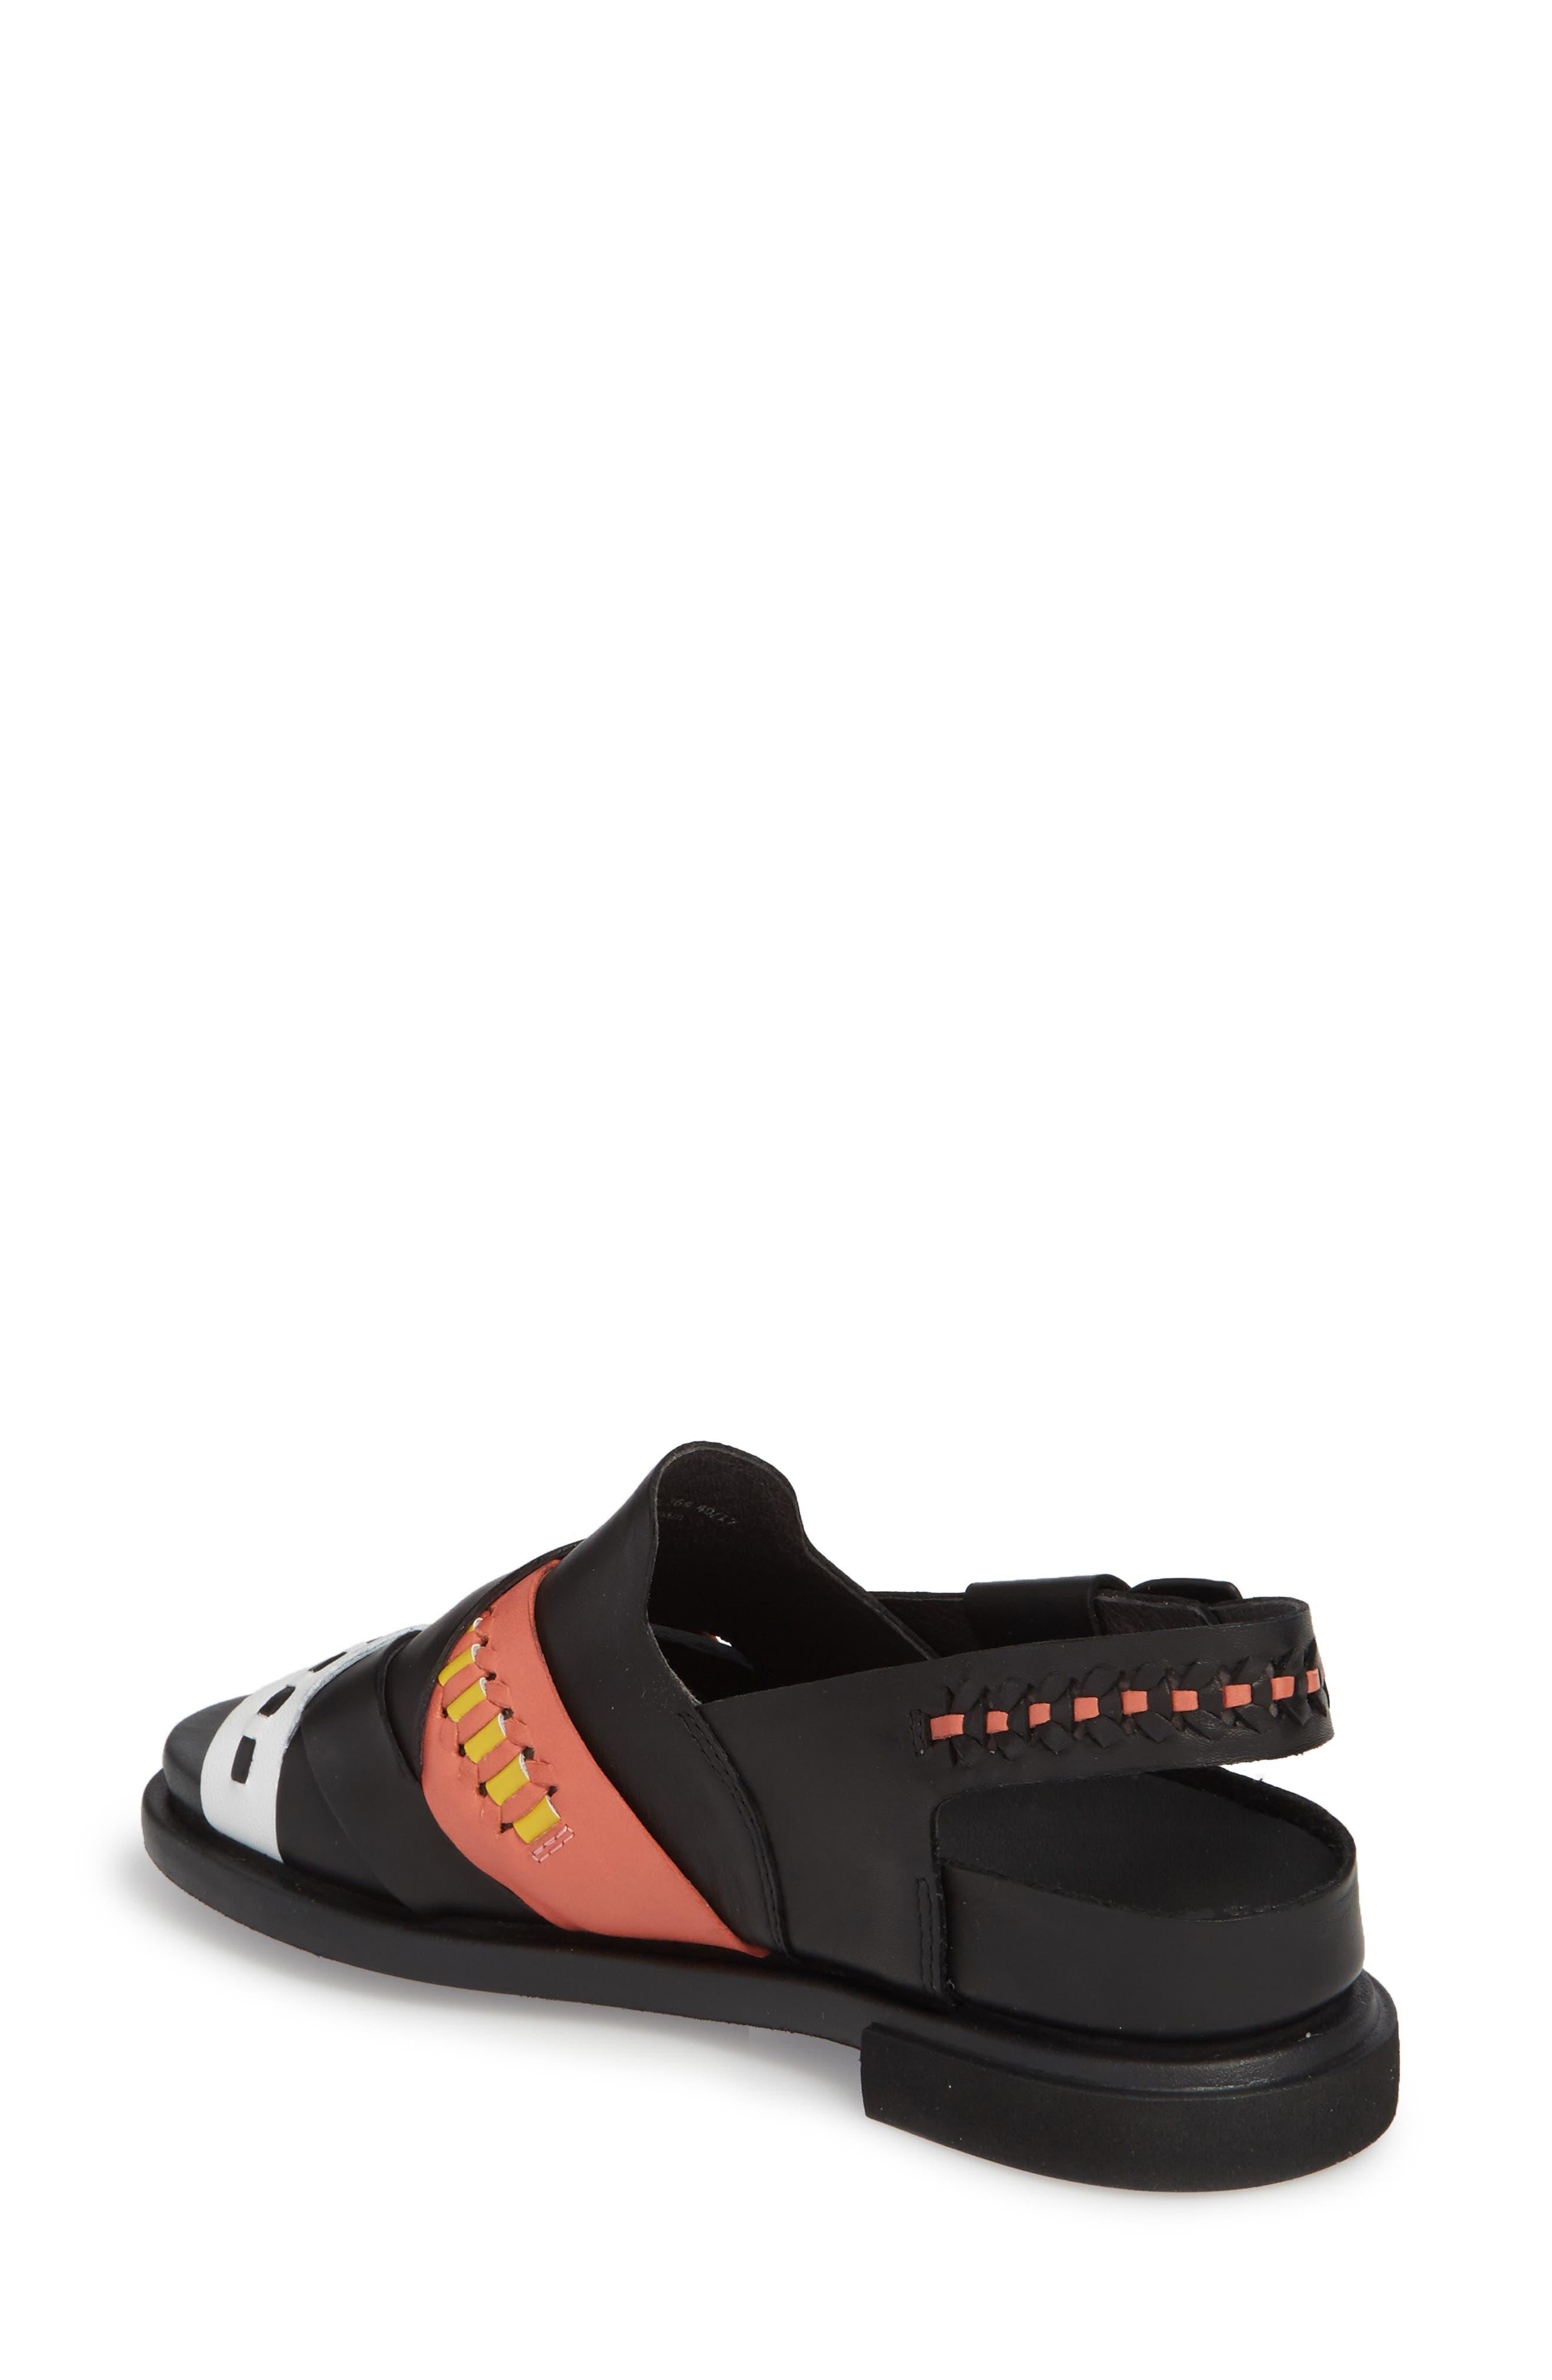 Twins Slingback Sandal,                             Alternate thumbnail 3, color,                             Multi - Assorted Leather